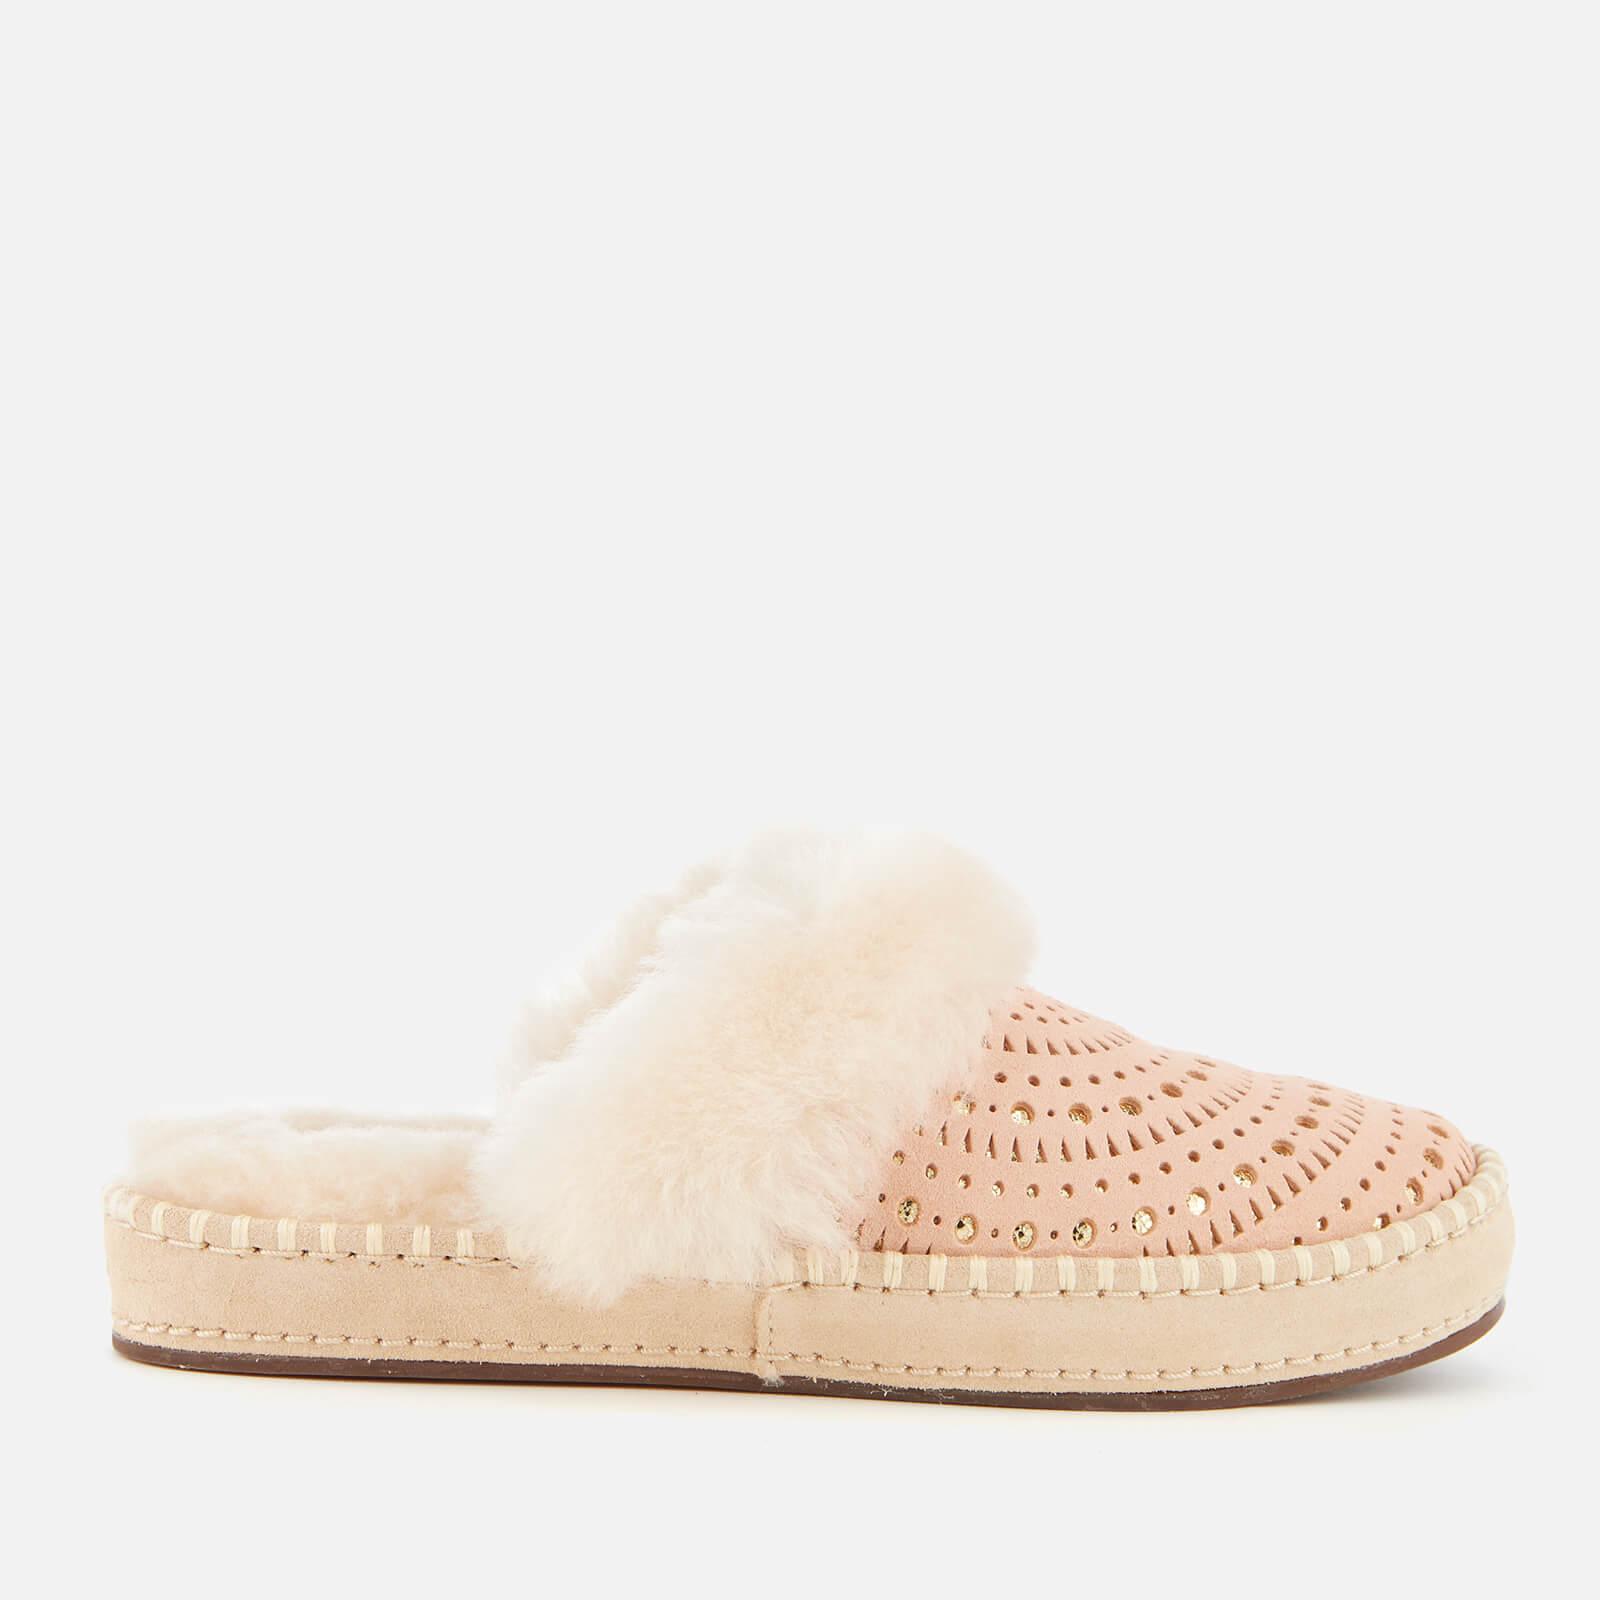 7008210a6a23 UGG Women s Aira Sunshine Perf Slippers - Tropical Peach Womens Footwear